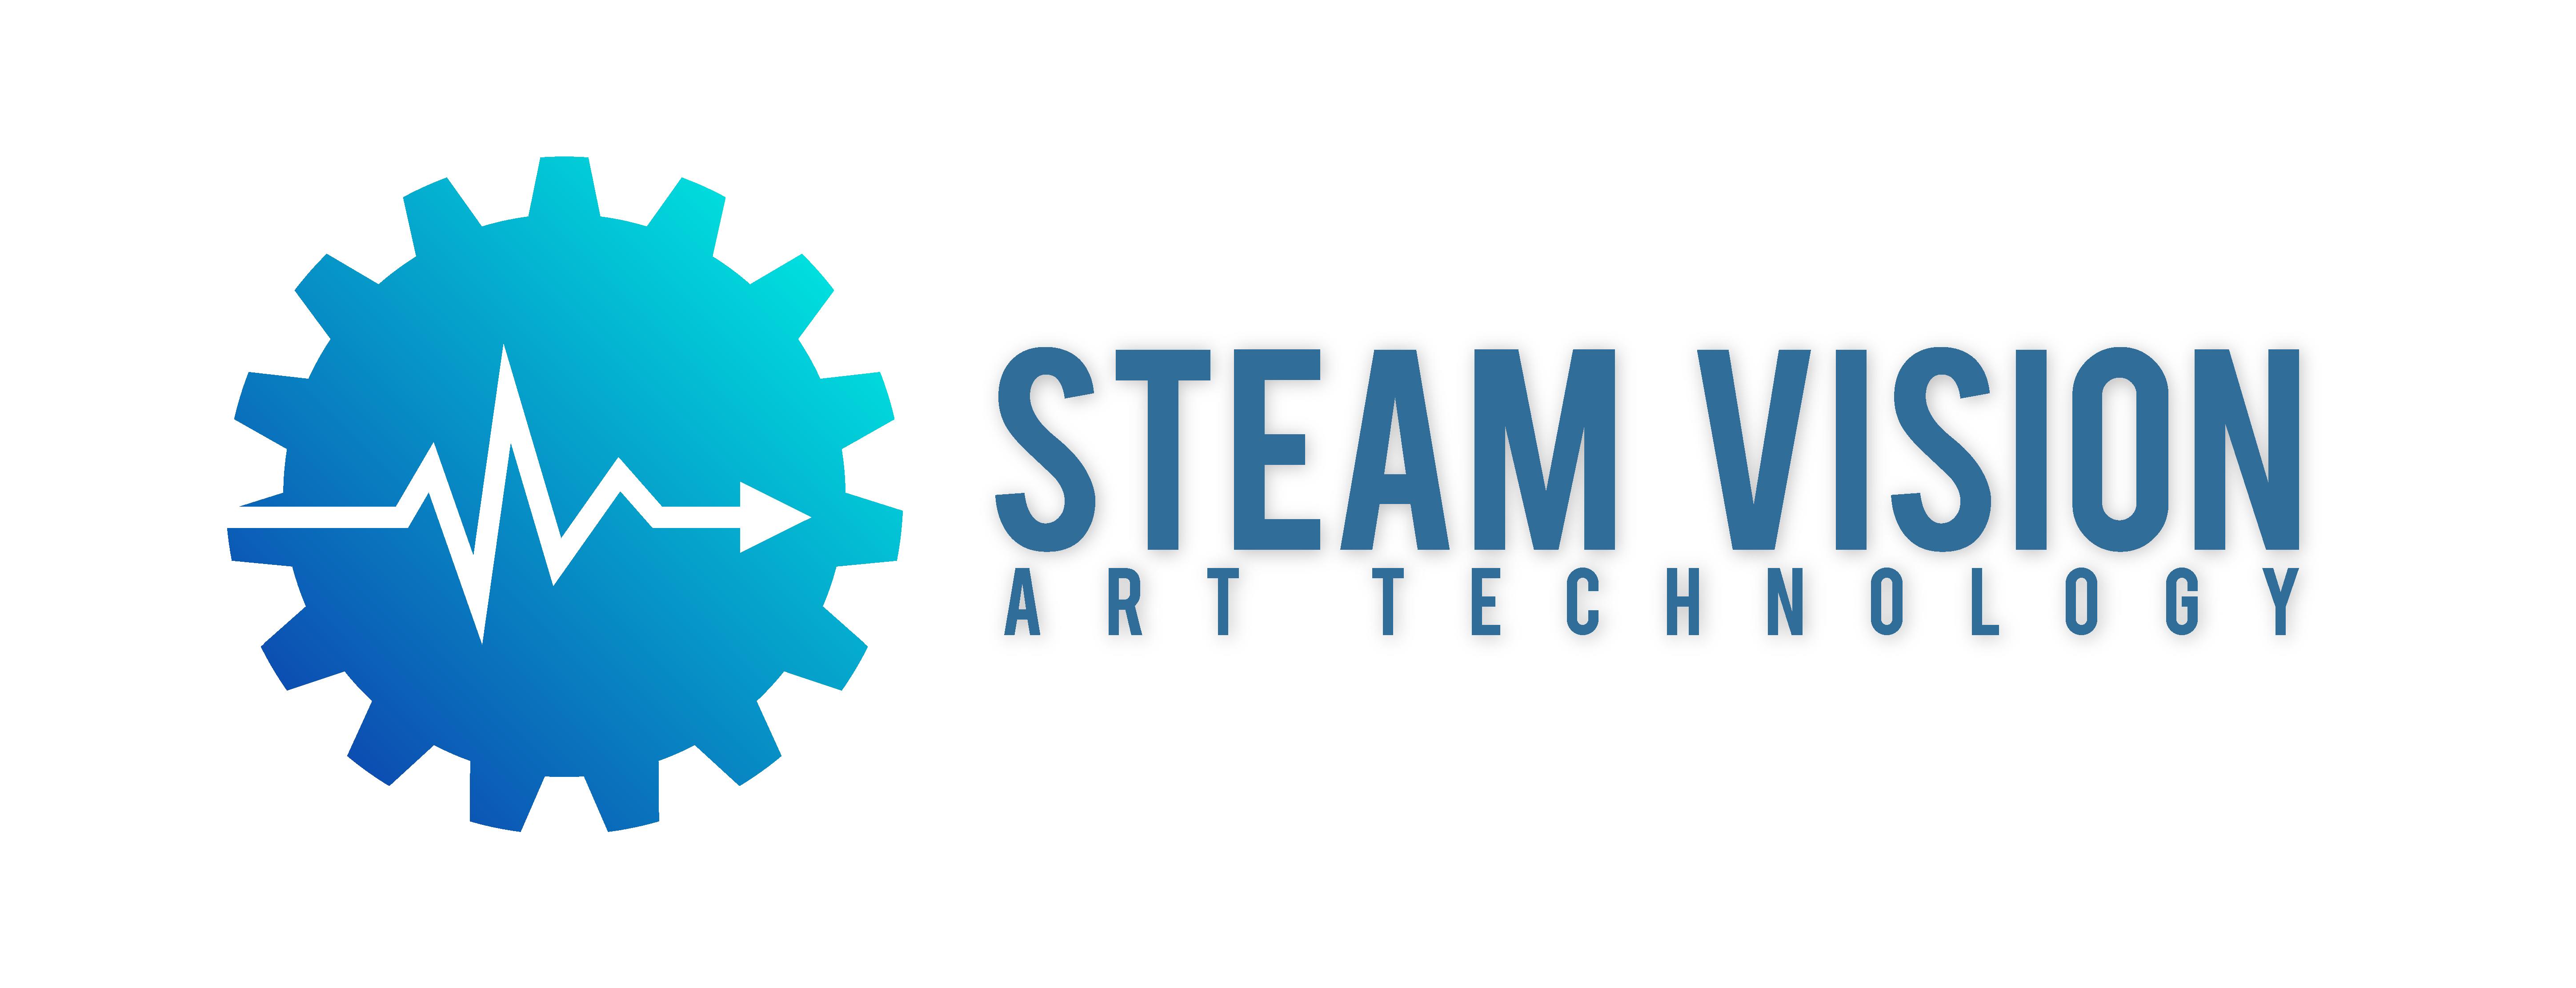 Steam Vision